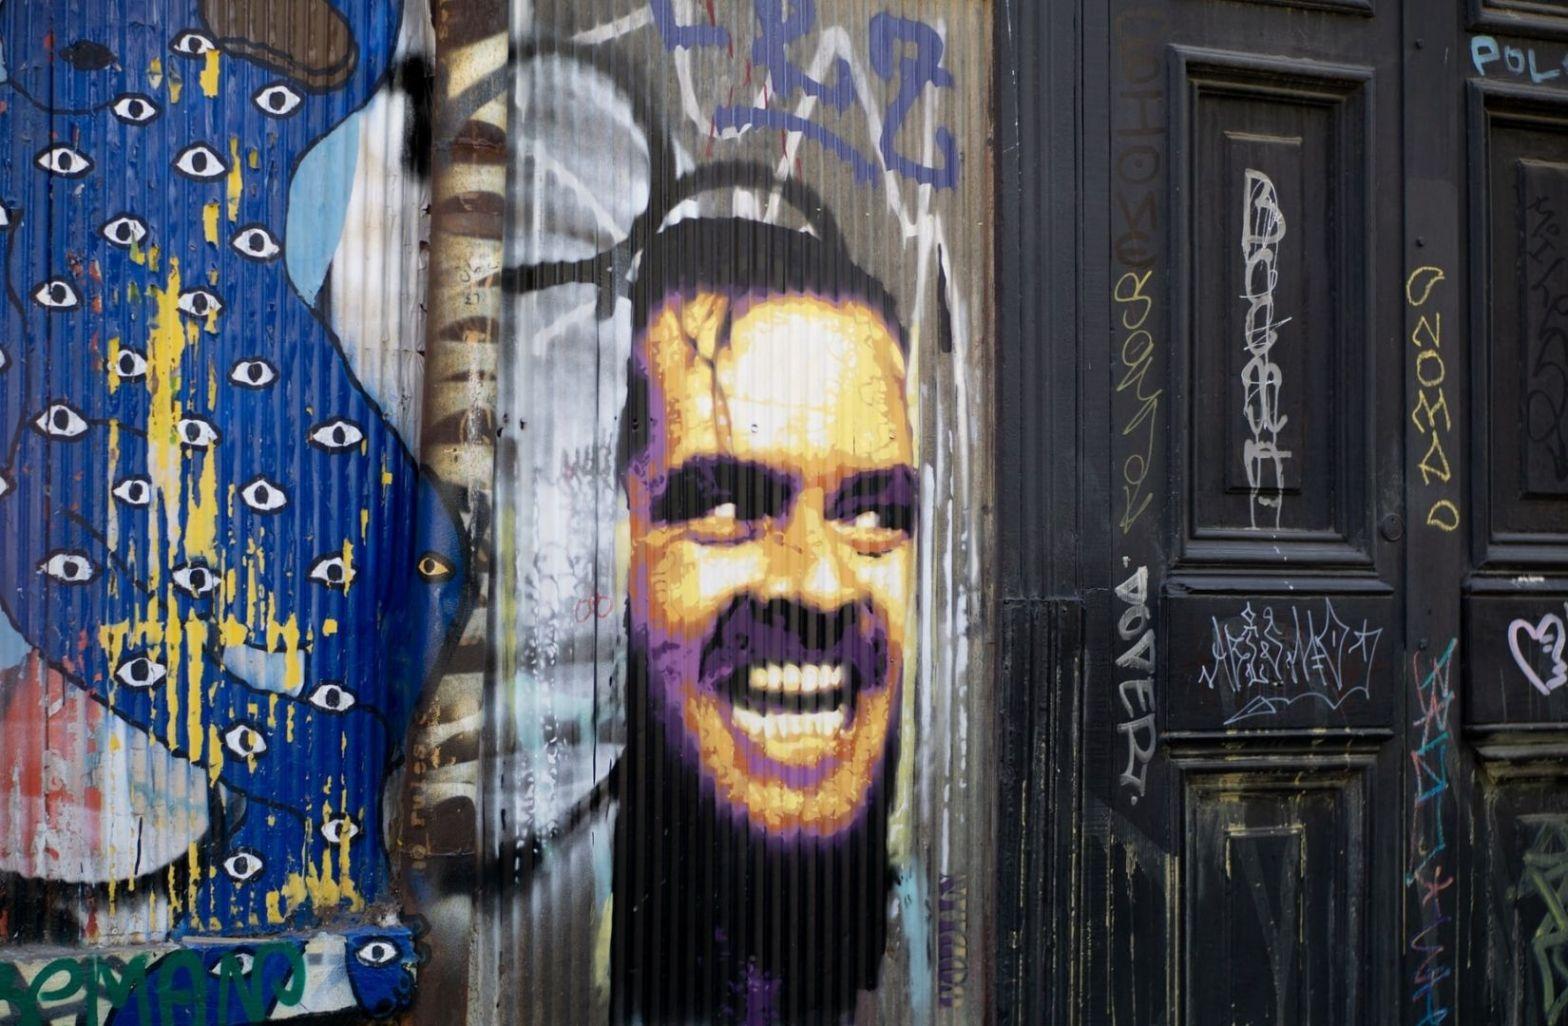 Lockdown als Ausgangspunkt. The Shining street mural graffiti art on a wall in the streets of Valparaiso, Chile. (Foto: Luis Villasmil, Unsplash.com)